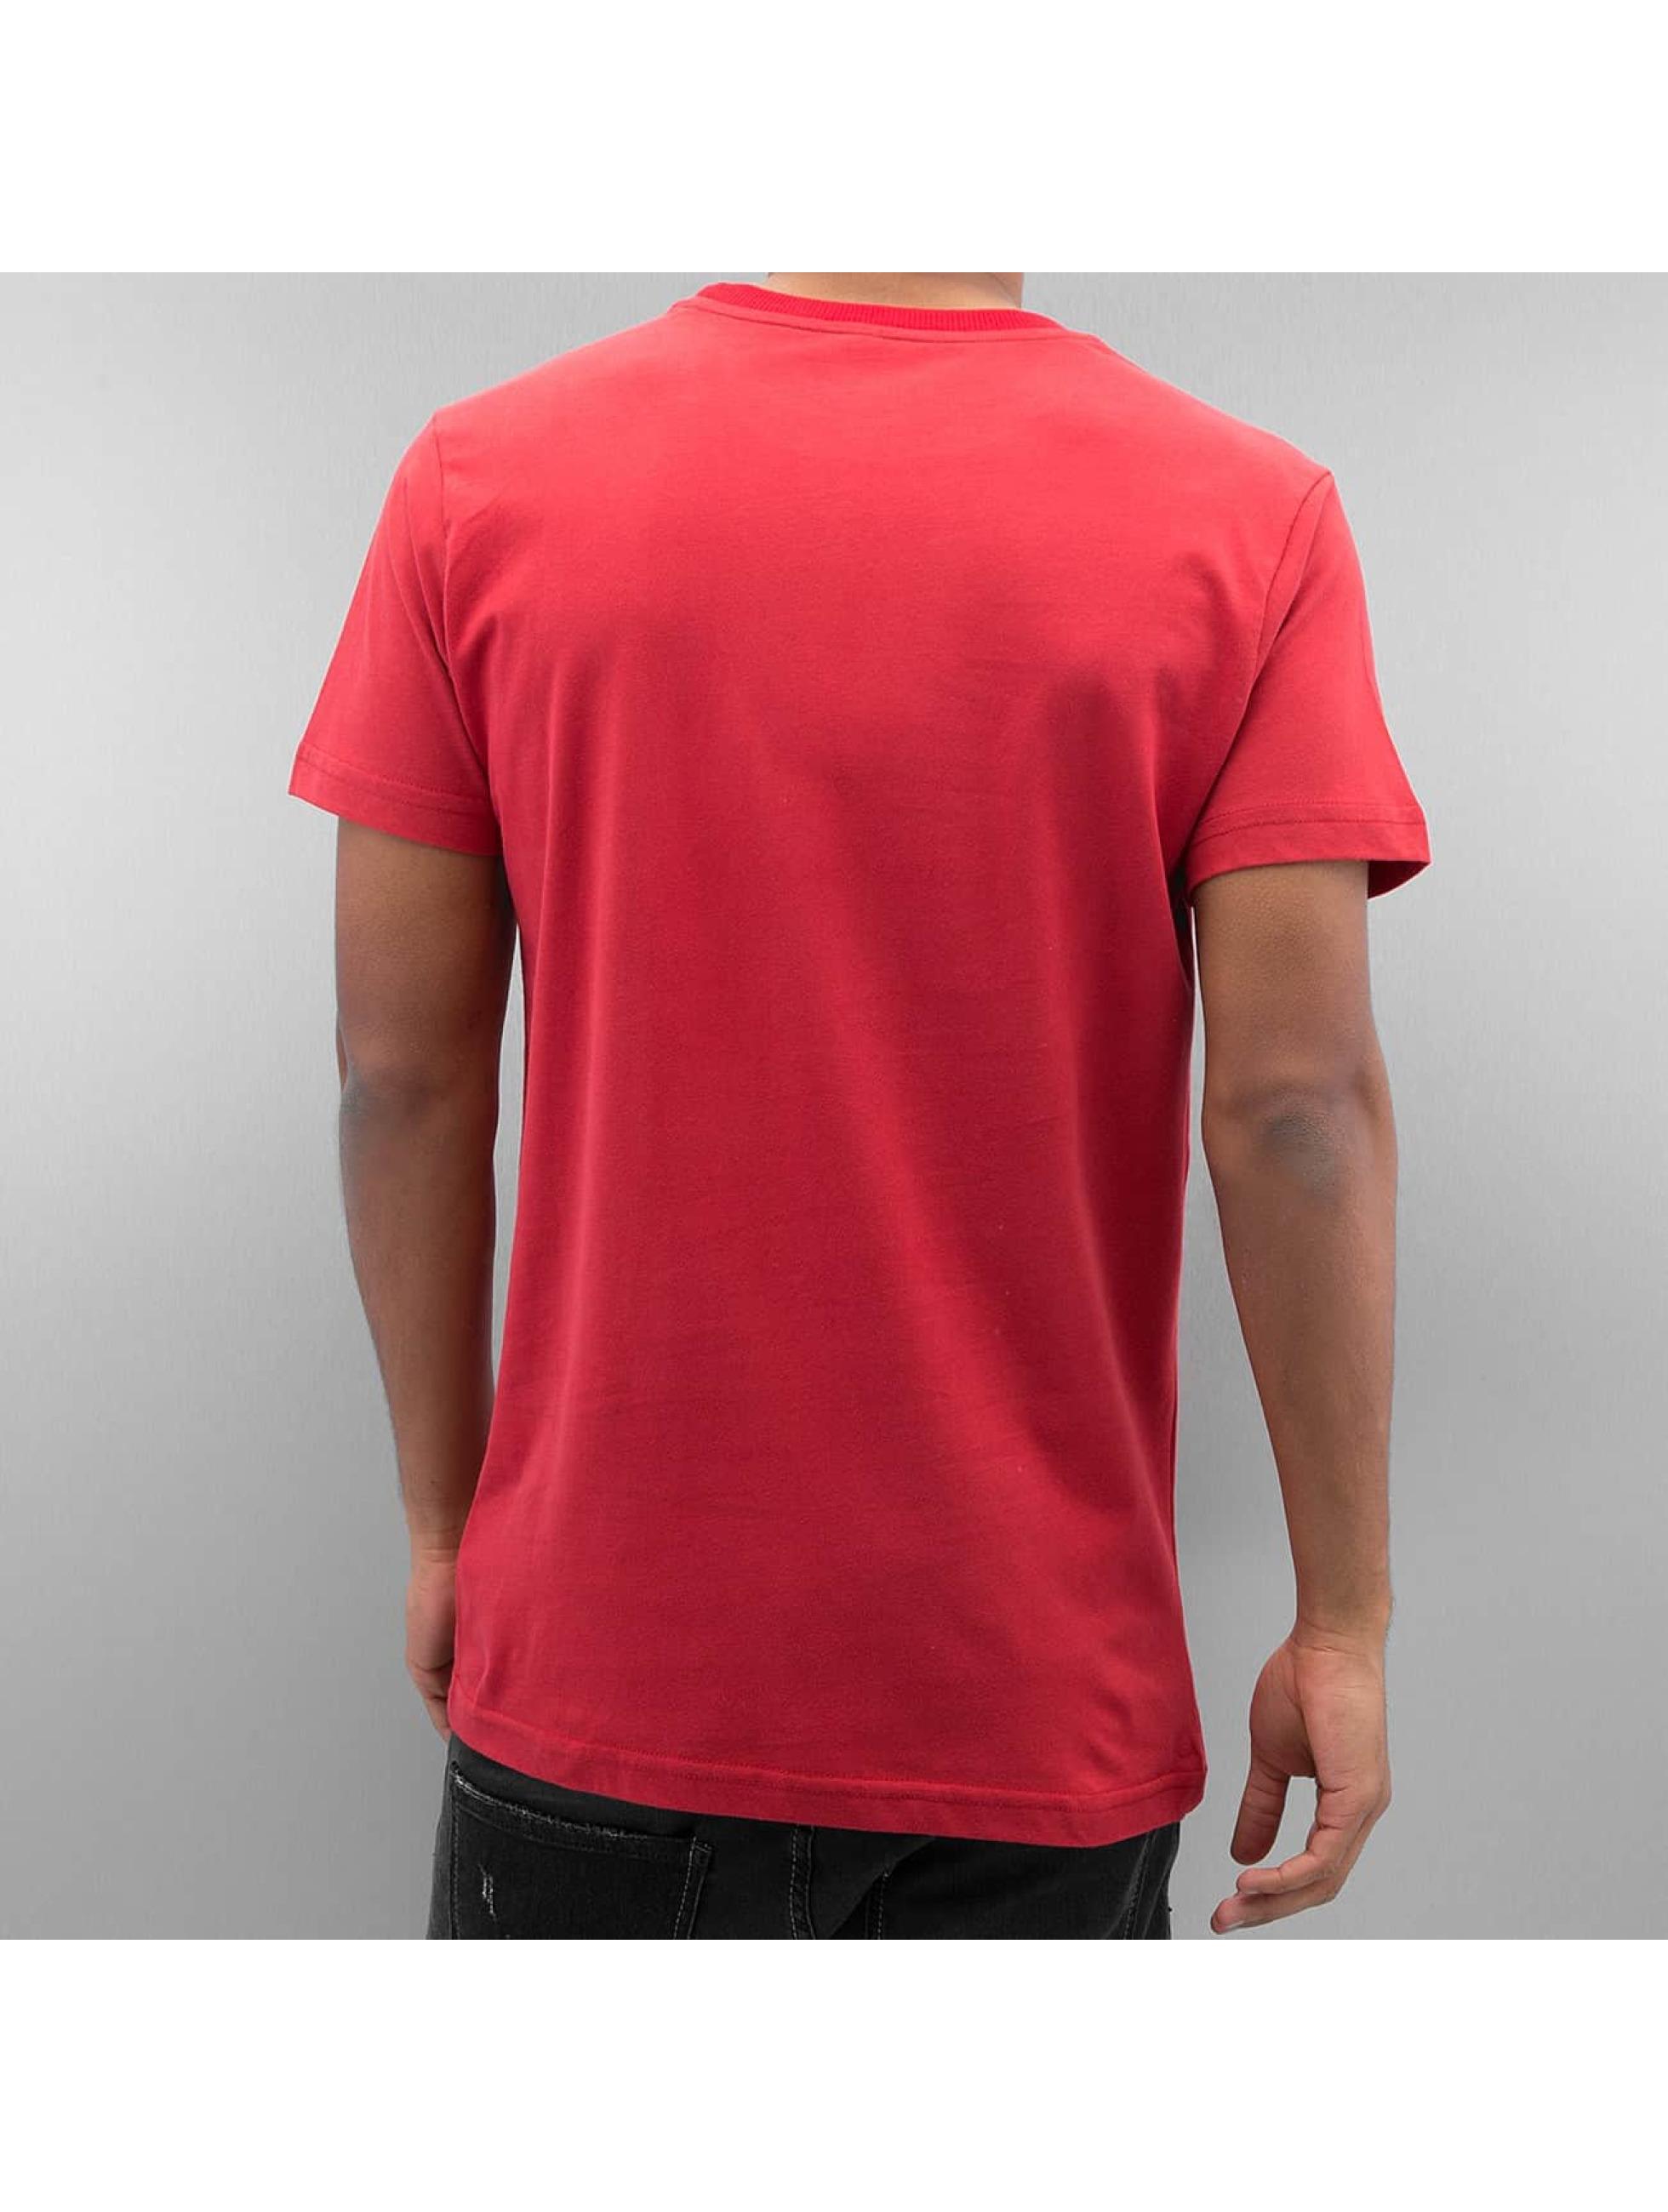 Amstaff T-Shirt Vintage Dorano red